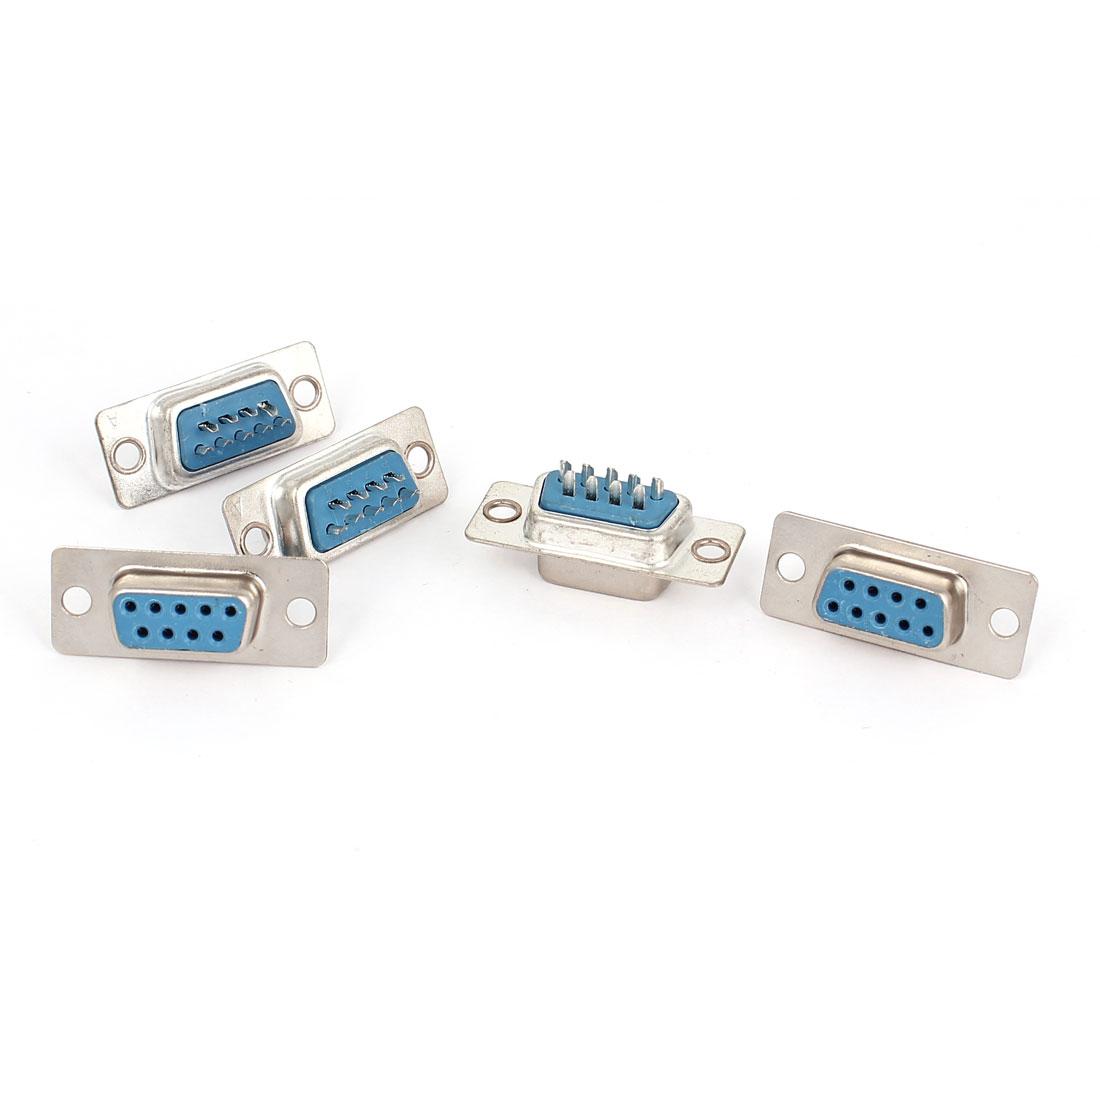 5pcs RS232 DB9 9 Pin Female Port DIP Mount VGA Socket Connector Adapter